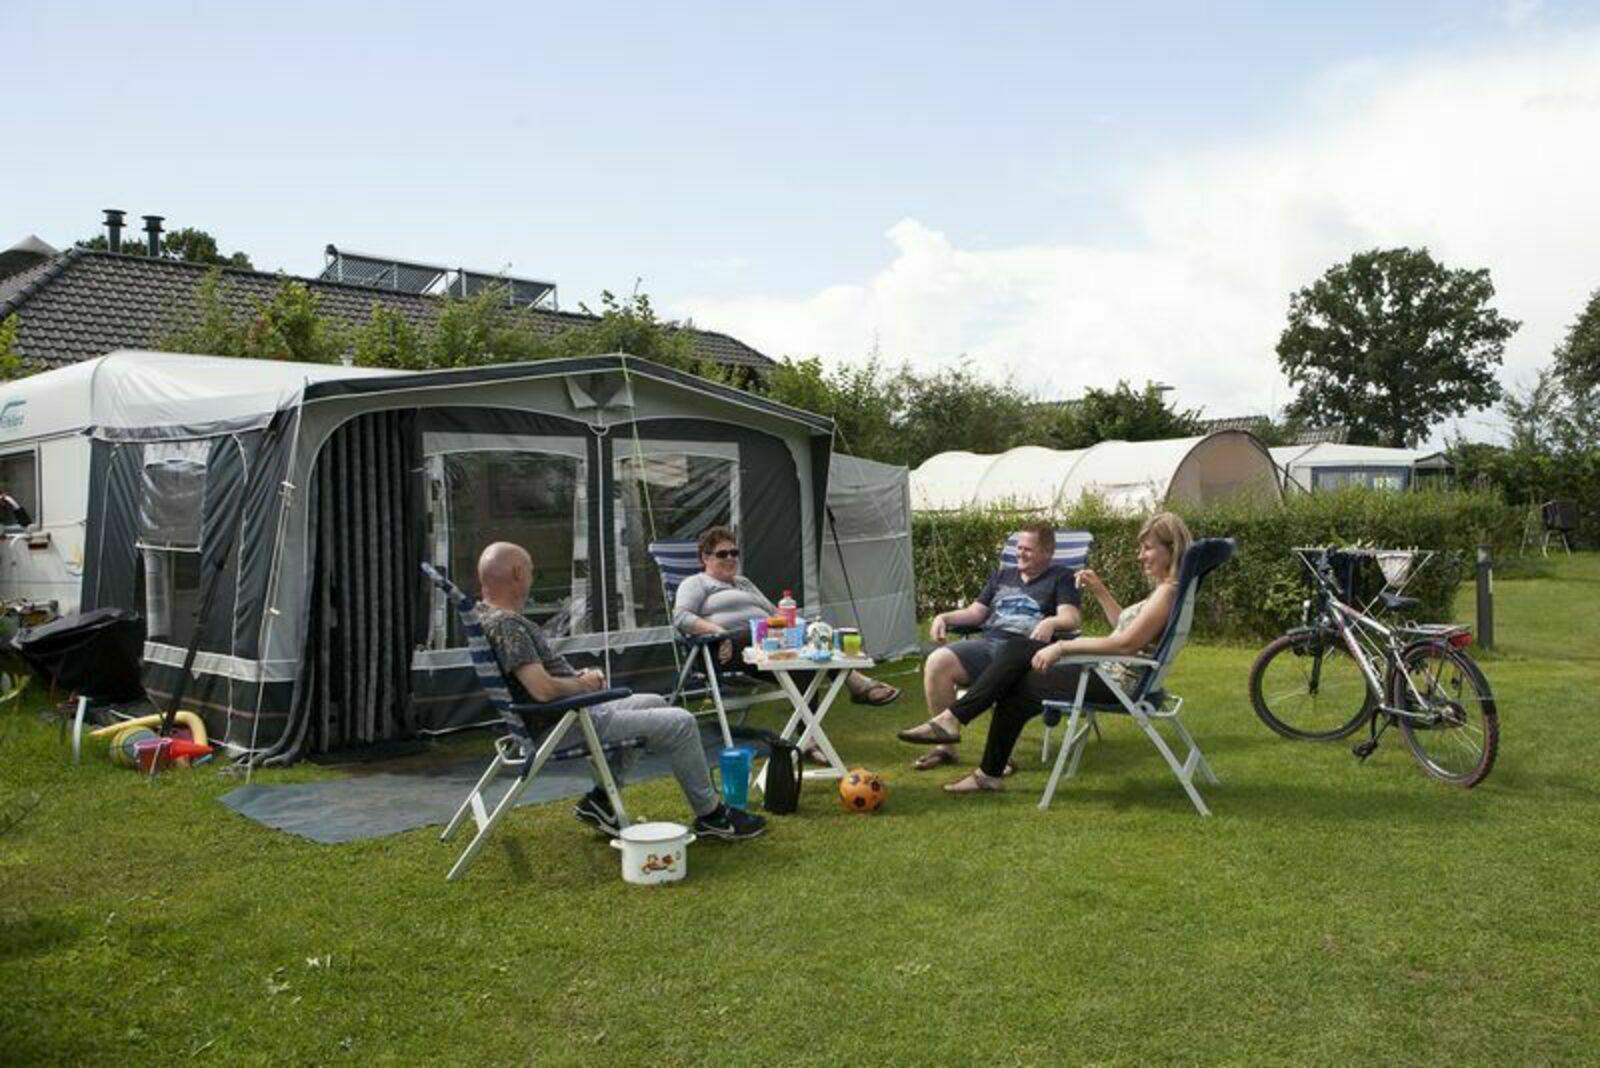 Camping preseason